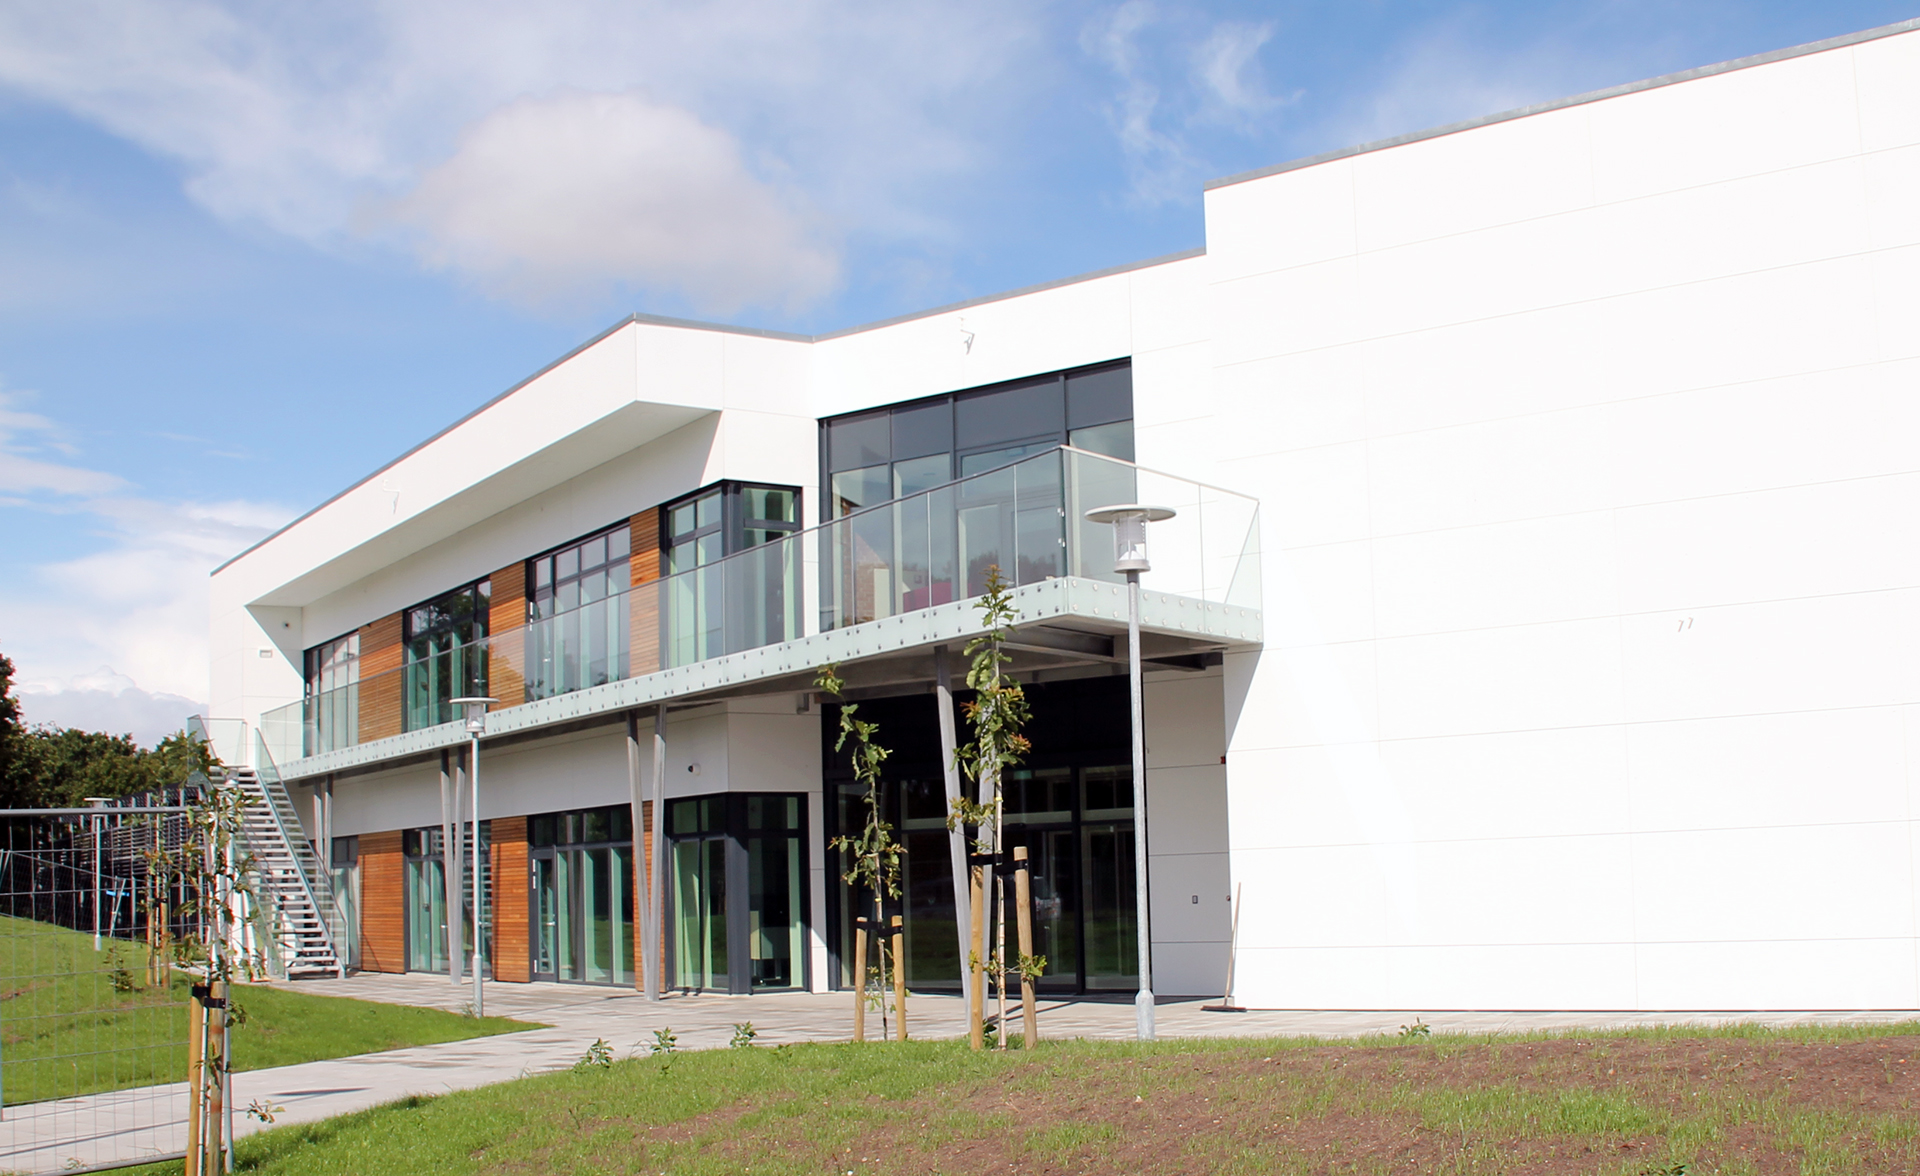 Skive-Hanselsskole